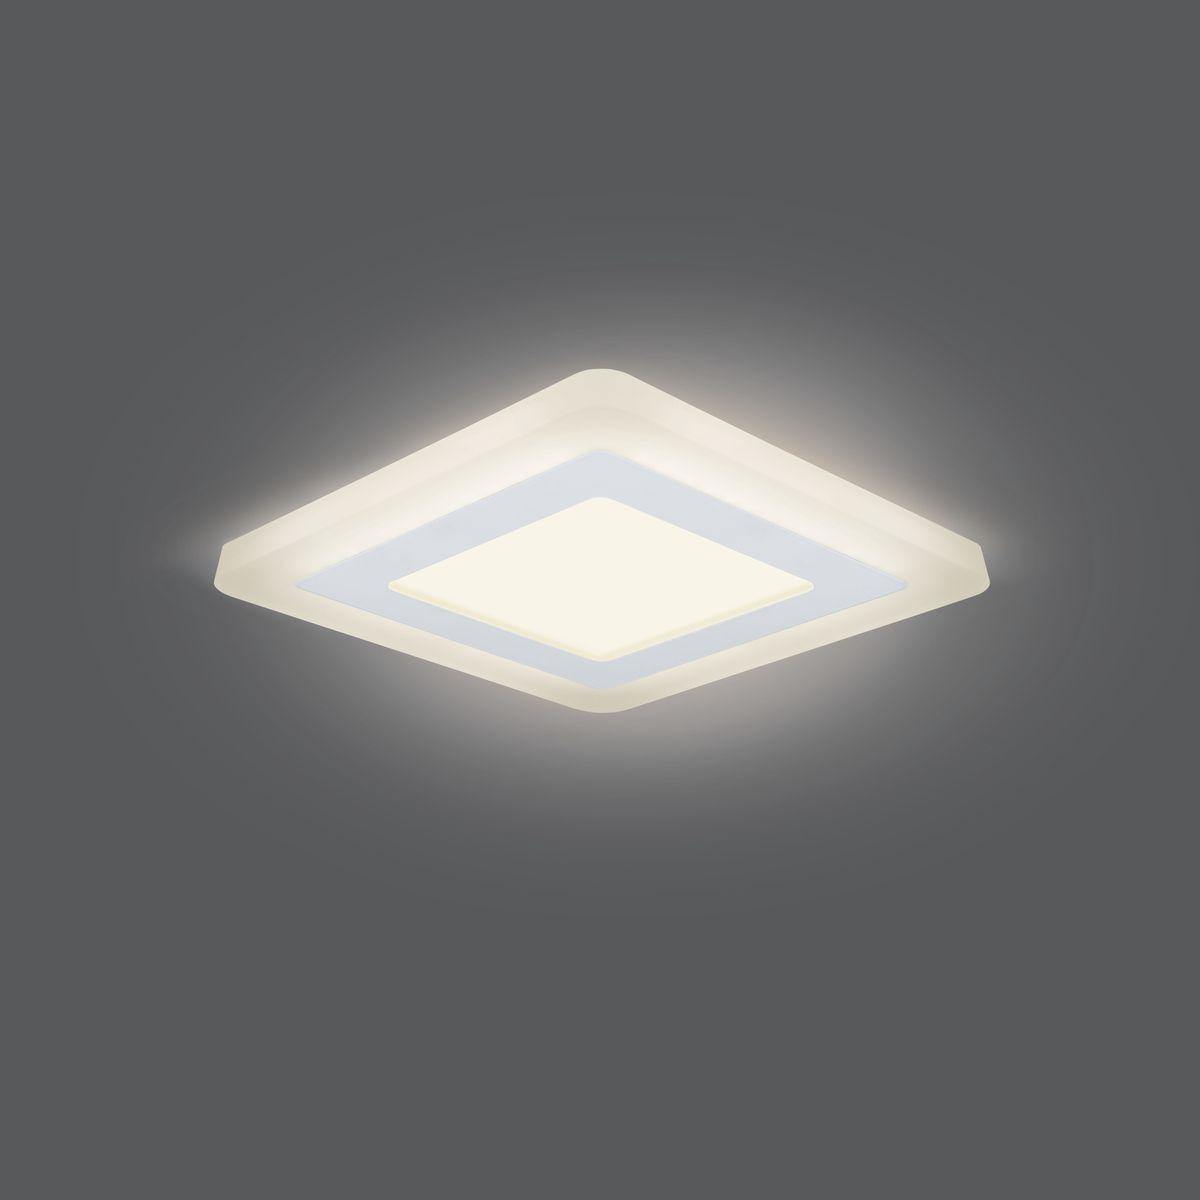 цена на Светильник Gauss Backlight LED, BL122, 6+3W, 3000K, 540Лм, 1/40